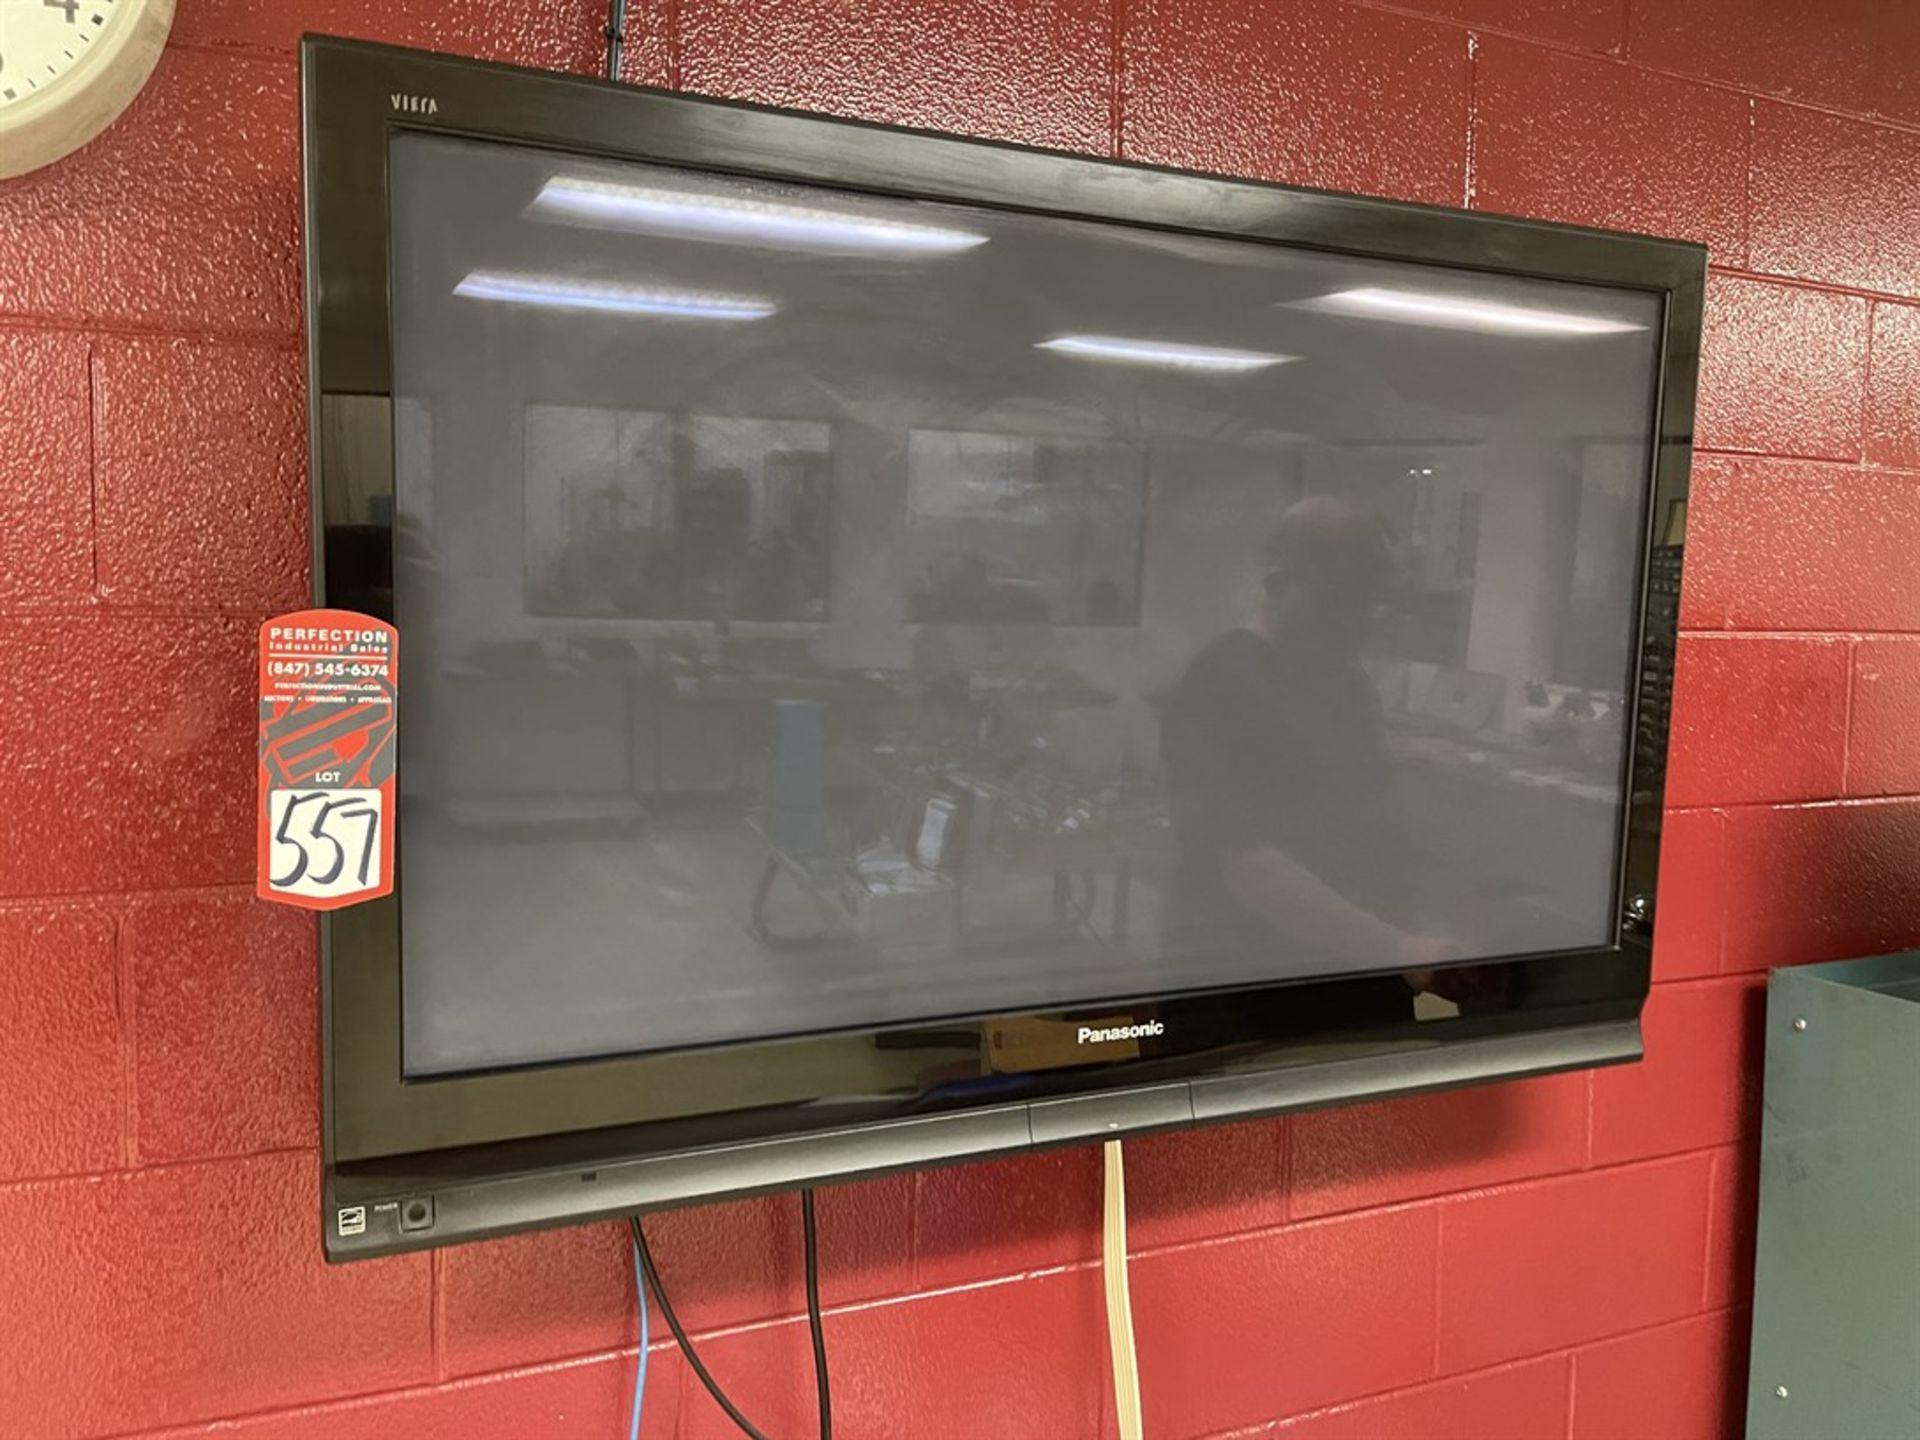 PANASONIC TH-50PX75U Flatscreen TV w/ Wall Mount